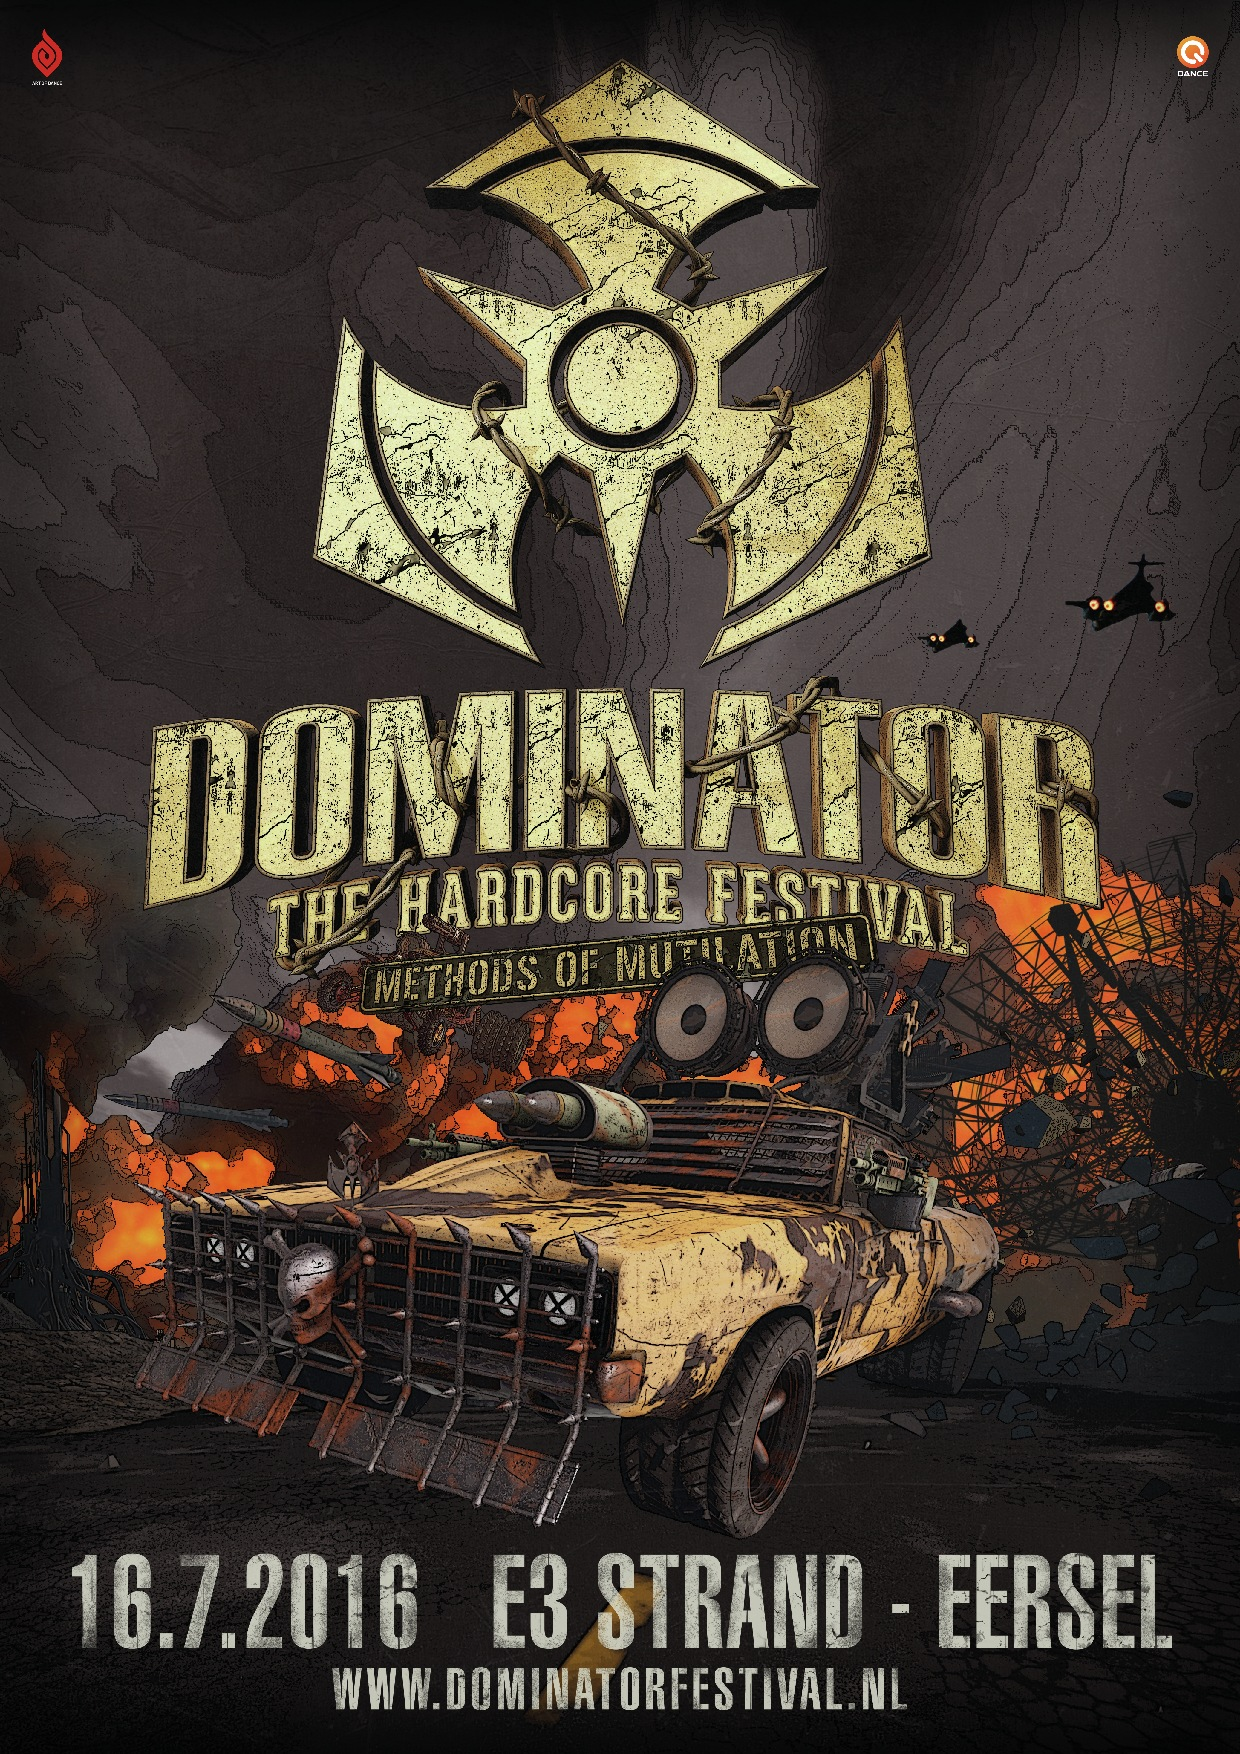 cyberfactory 2016 dominator hardcore festival e3 strand eersel nederland